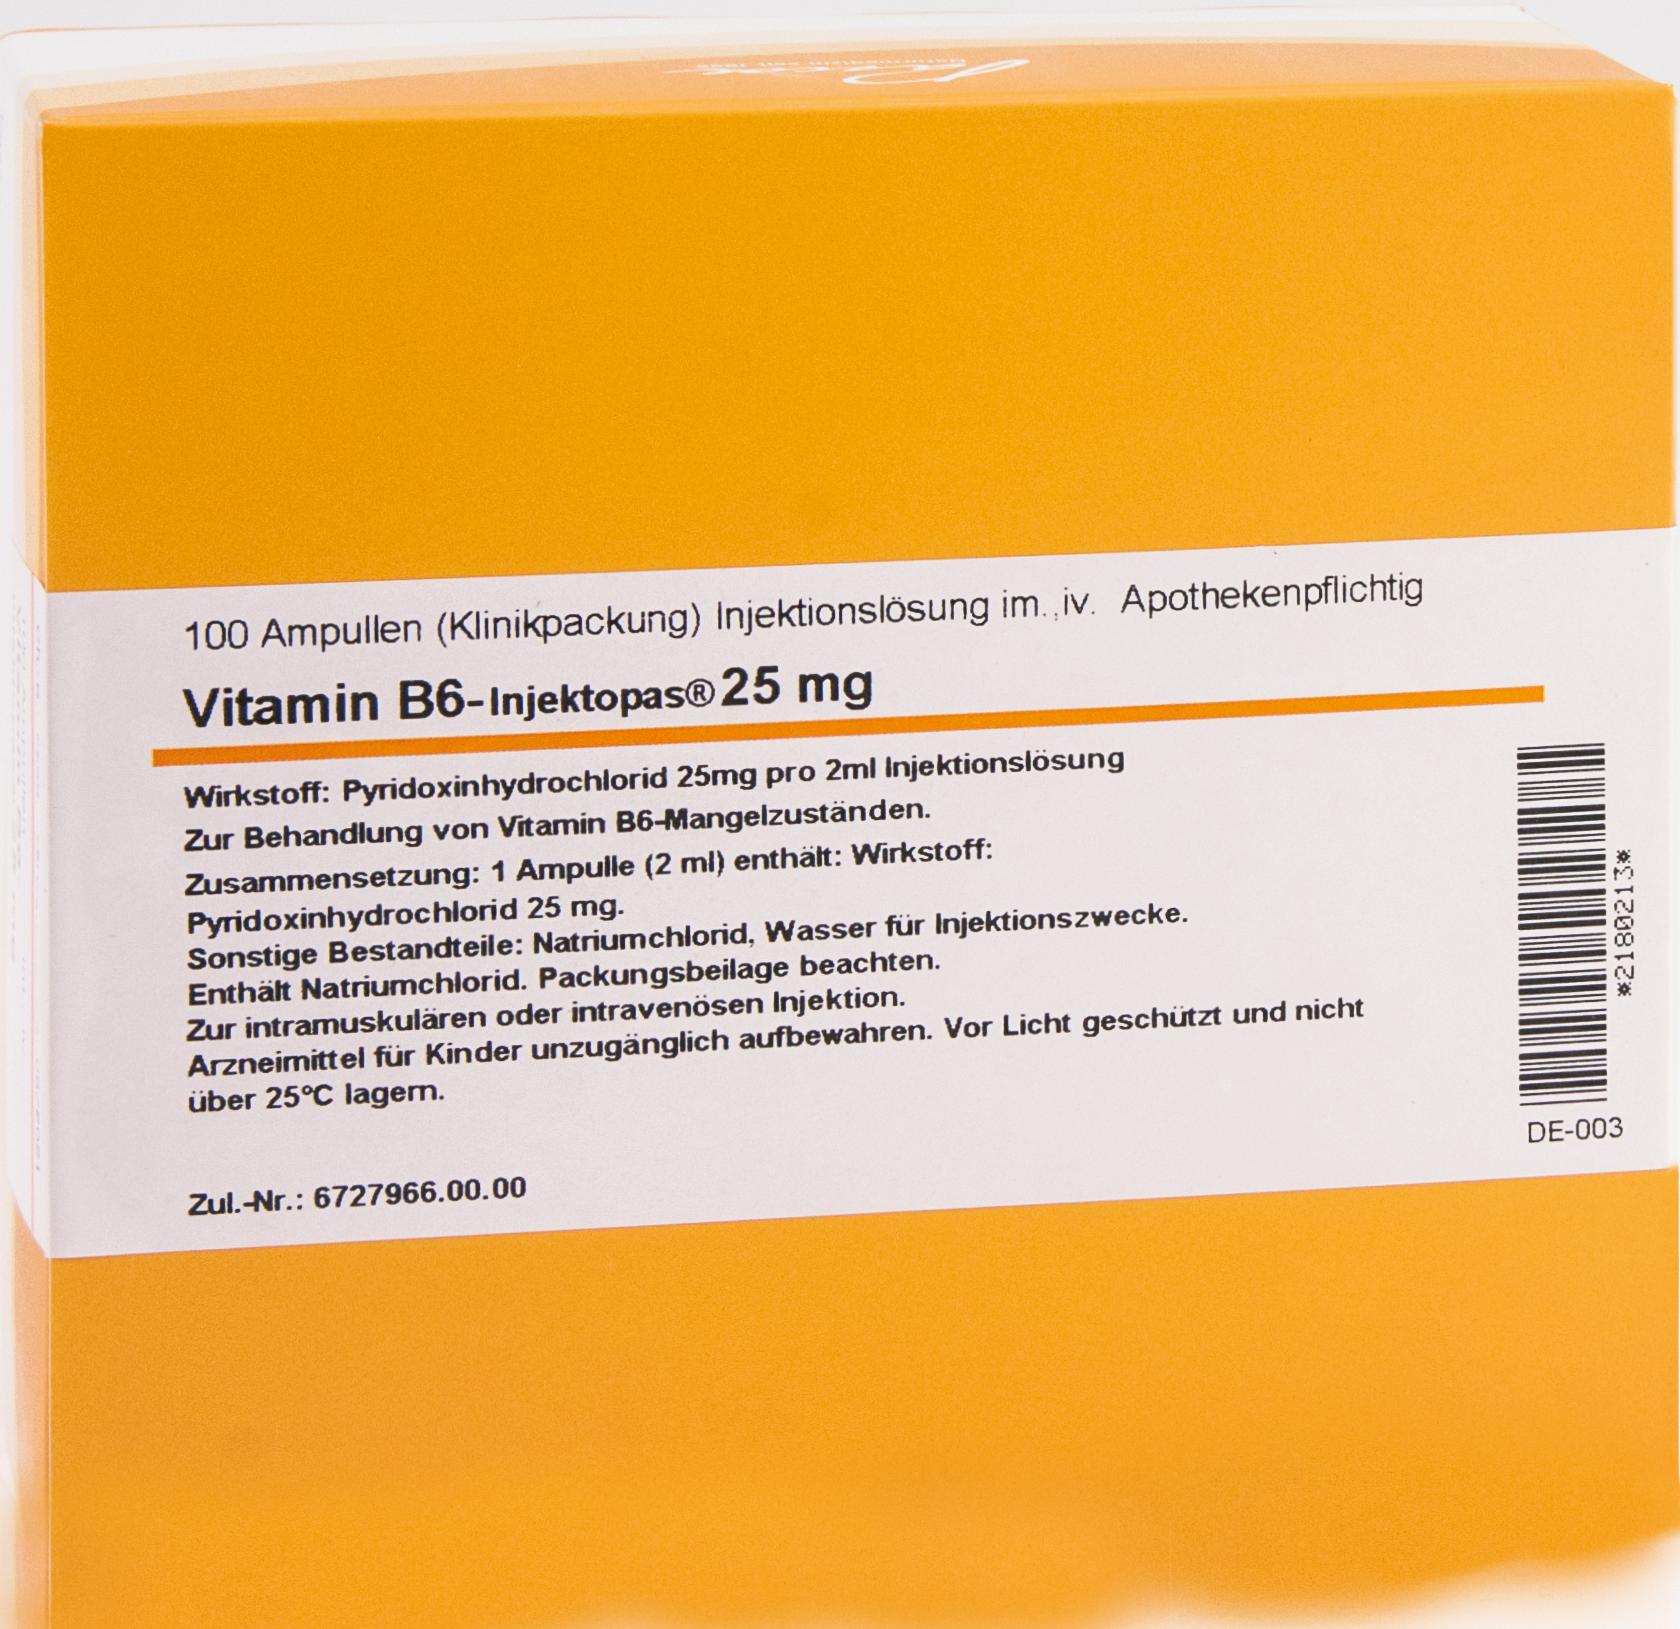 VITAMIN B6-Injektopas 25mg